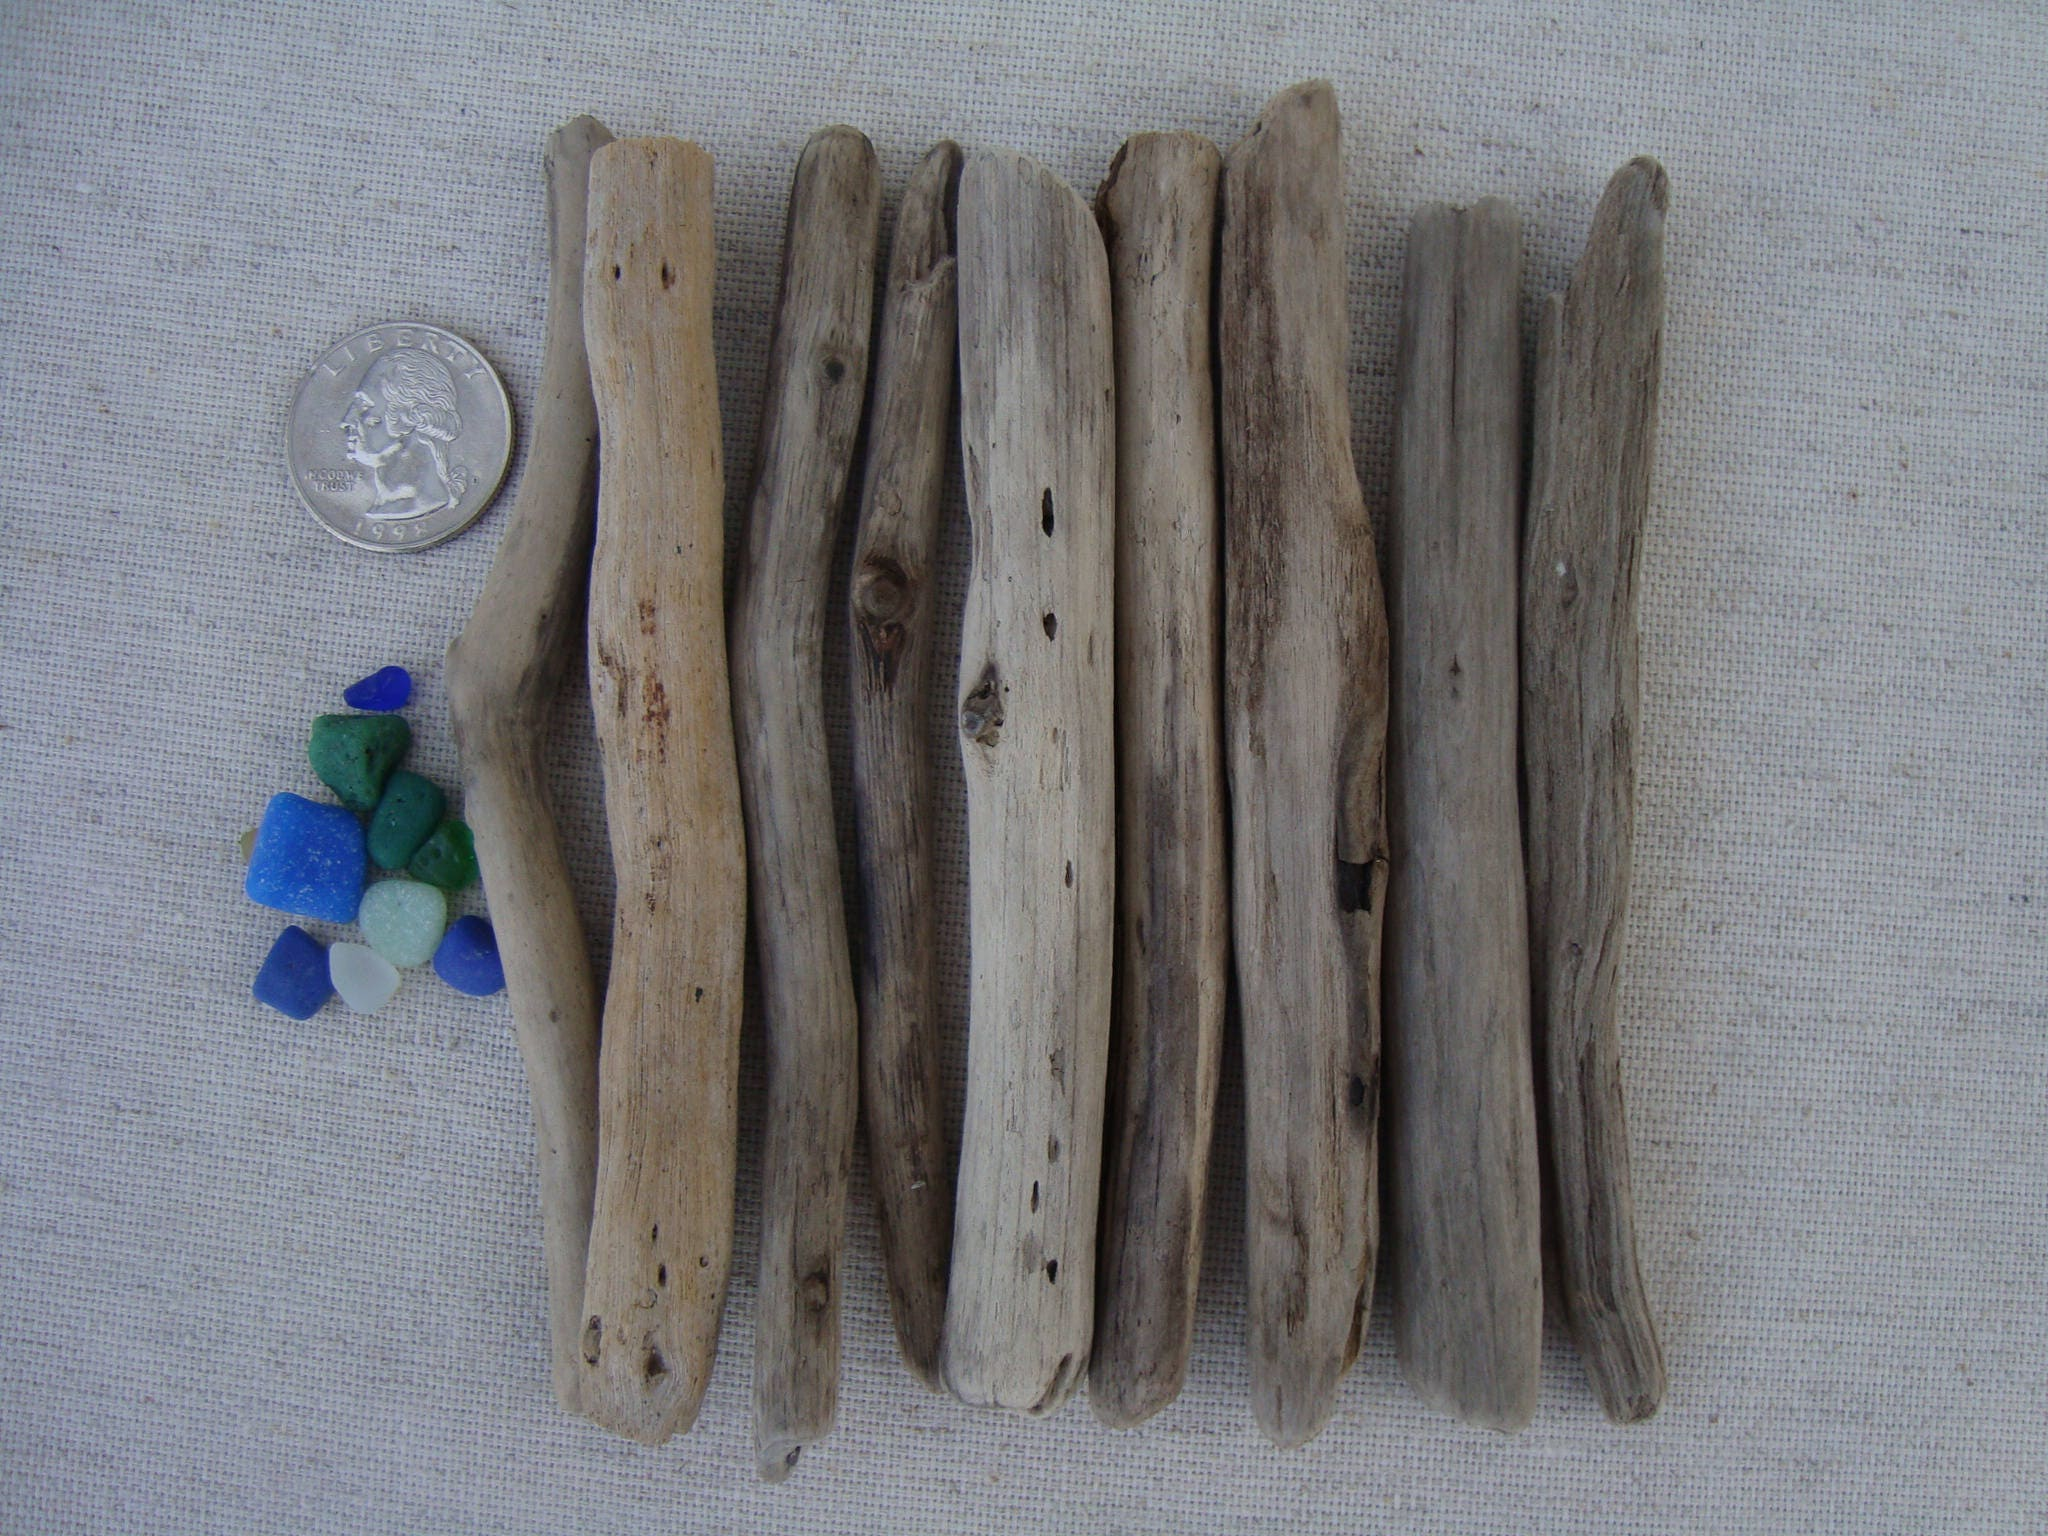 Driftwood 5 9 pcs genuine driftwood bois flott craft for Achat bois flotte decoration